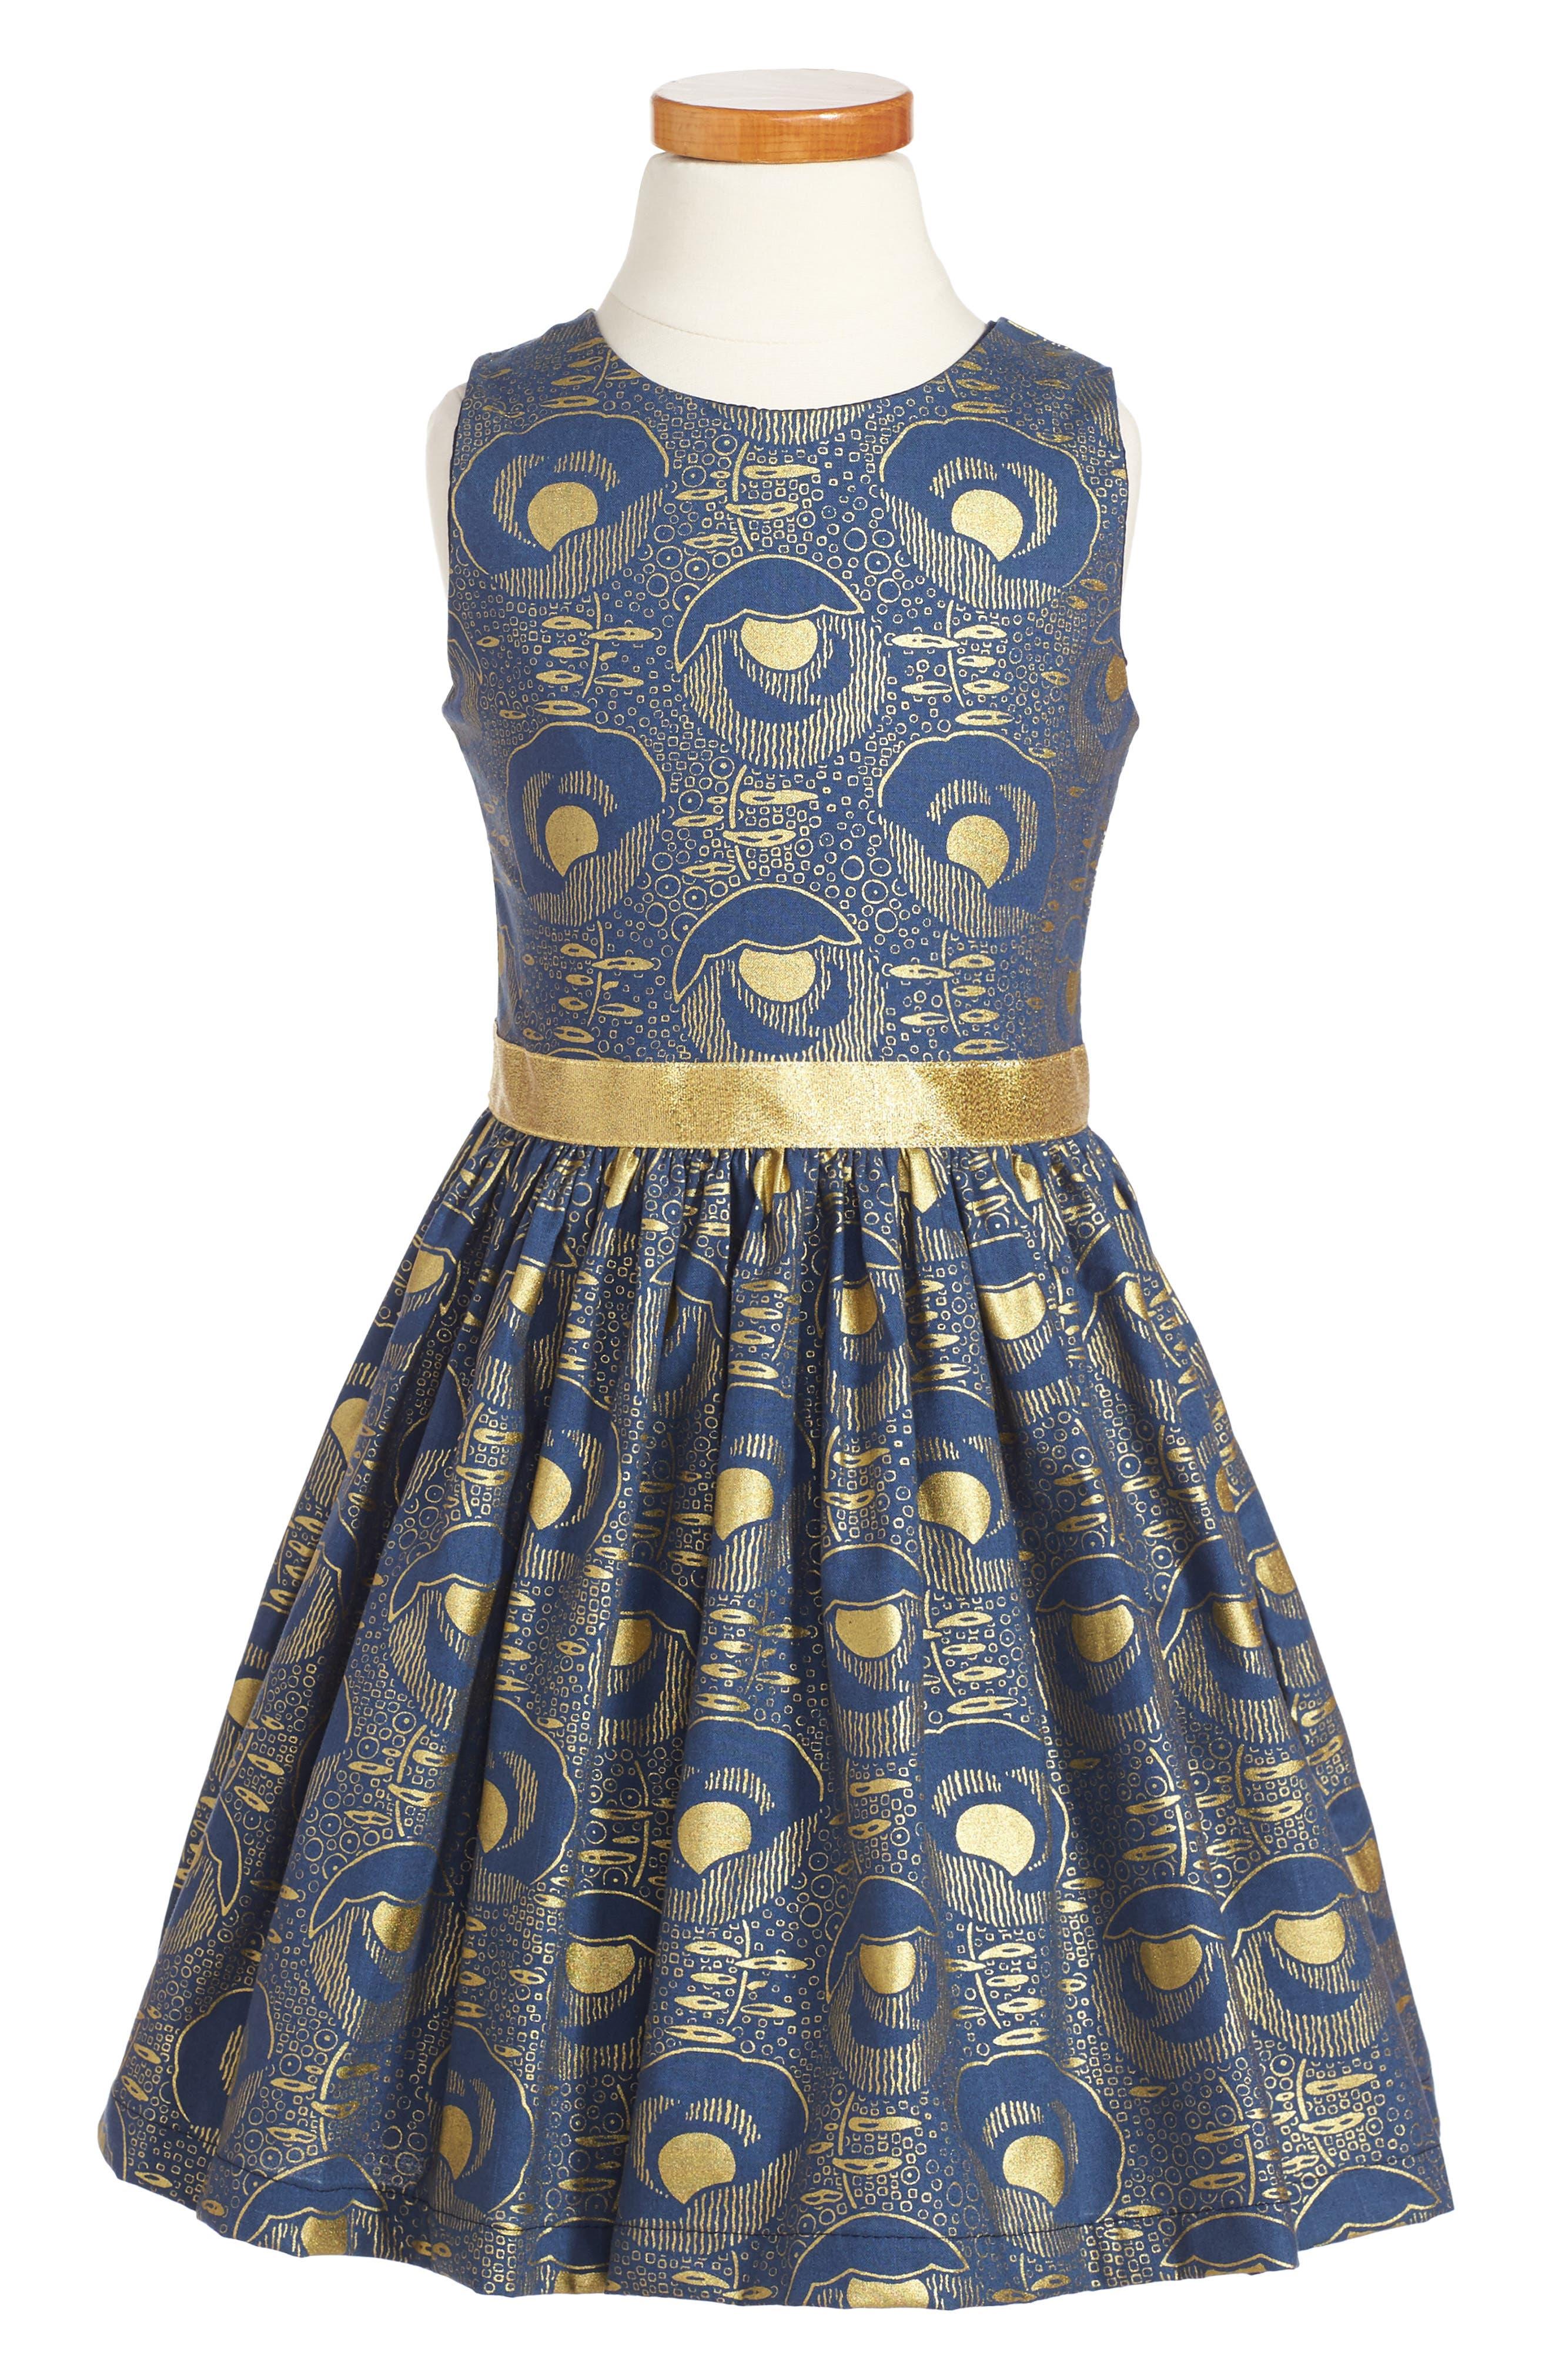 Fiveloaves Twofish Mollie Art Noveau Party Dress (Toddler Girls, Little Girls & Big Girls)